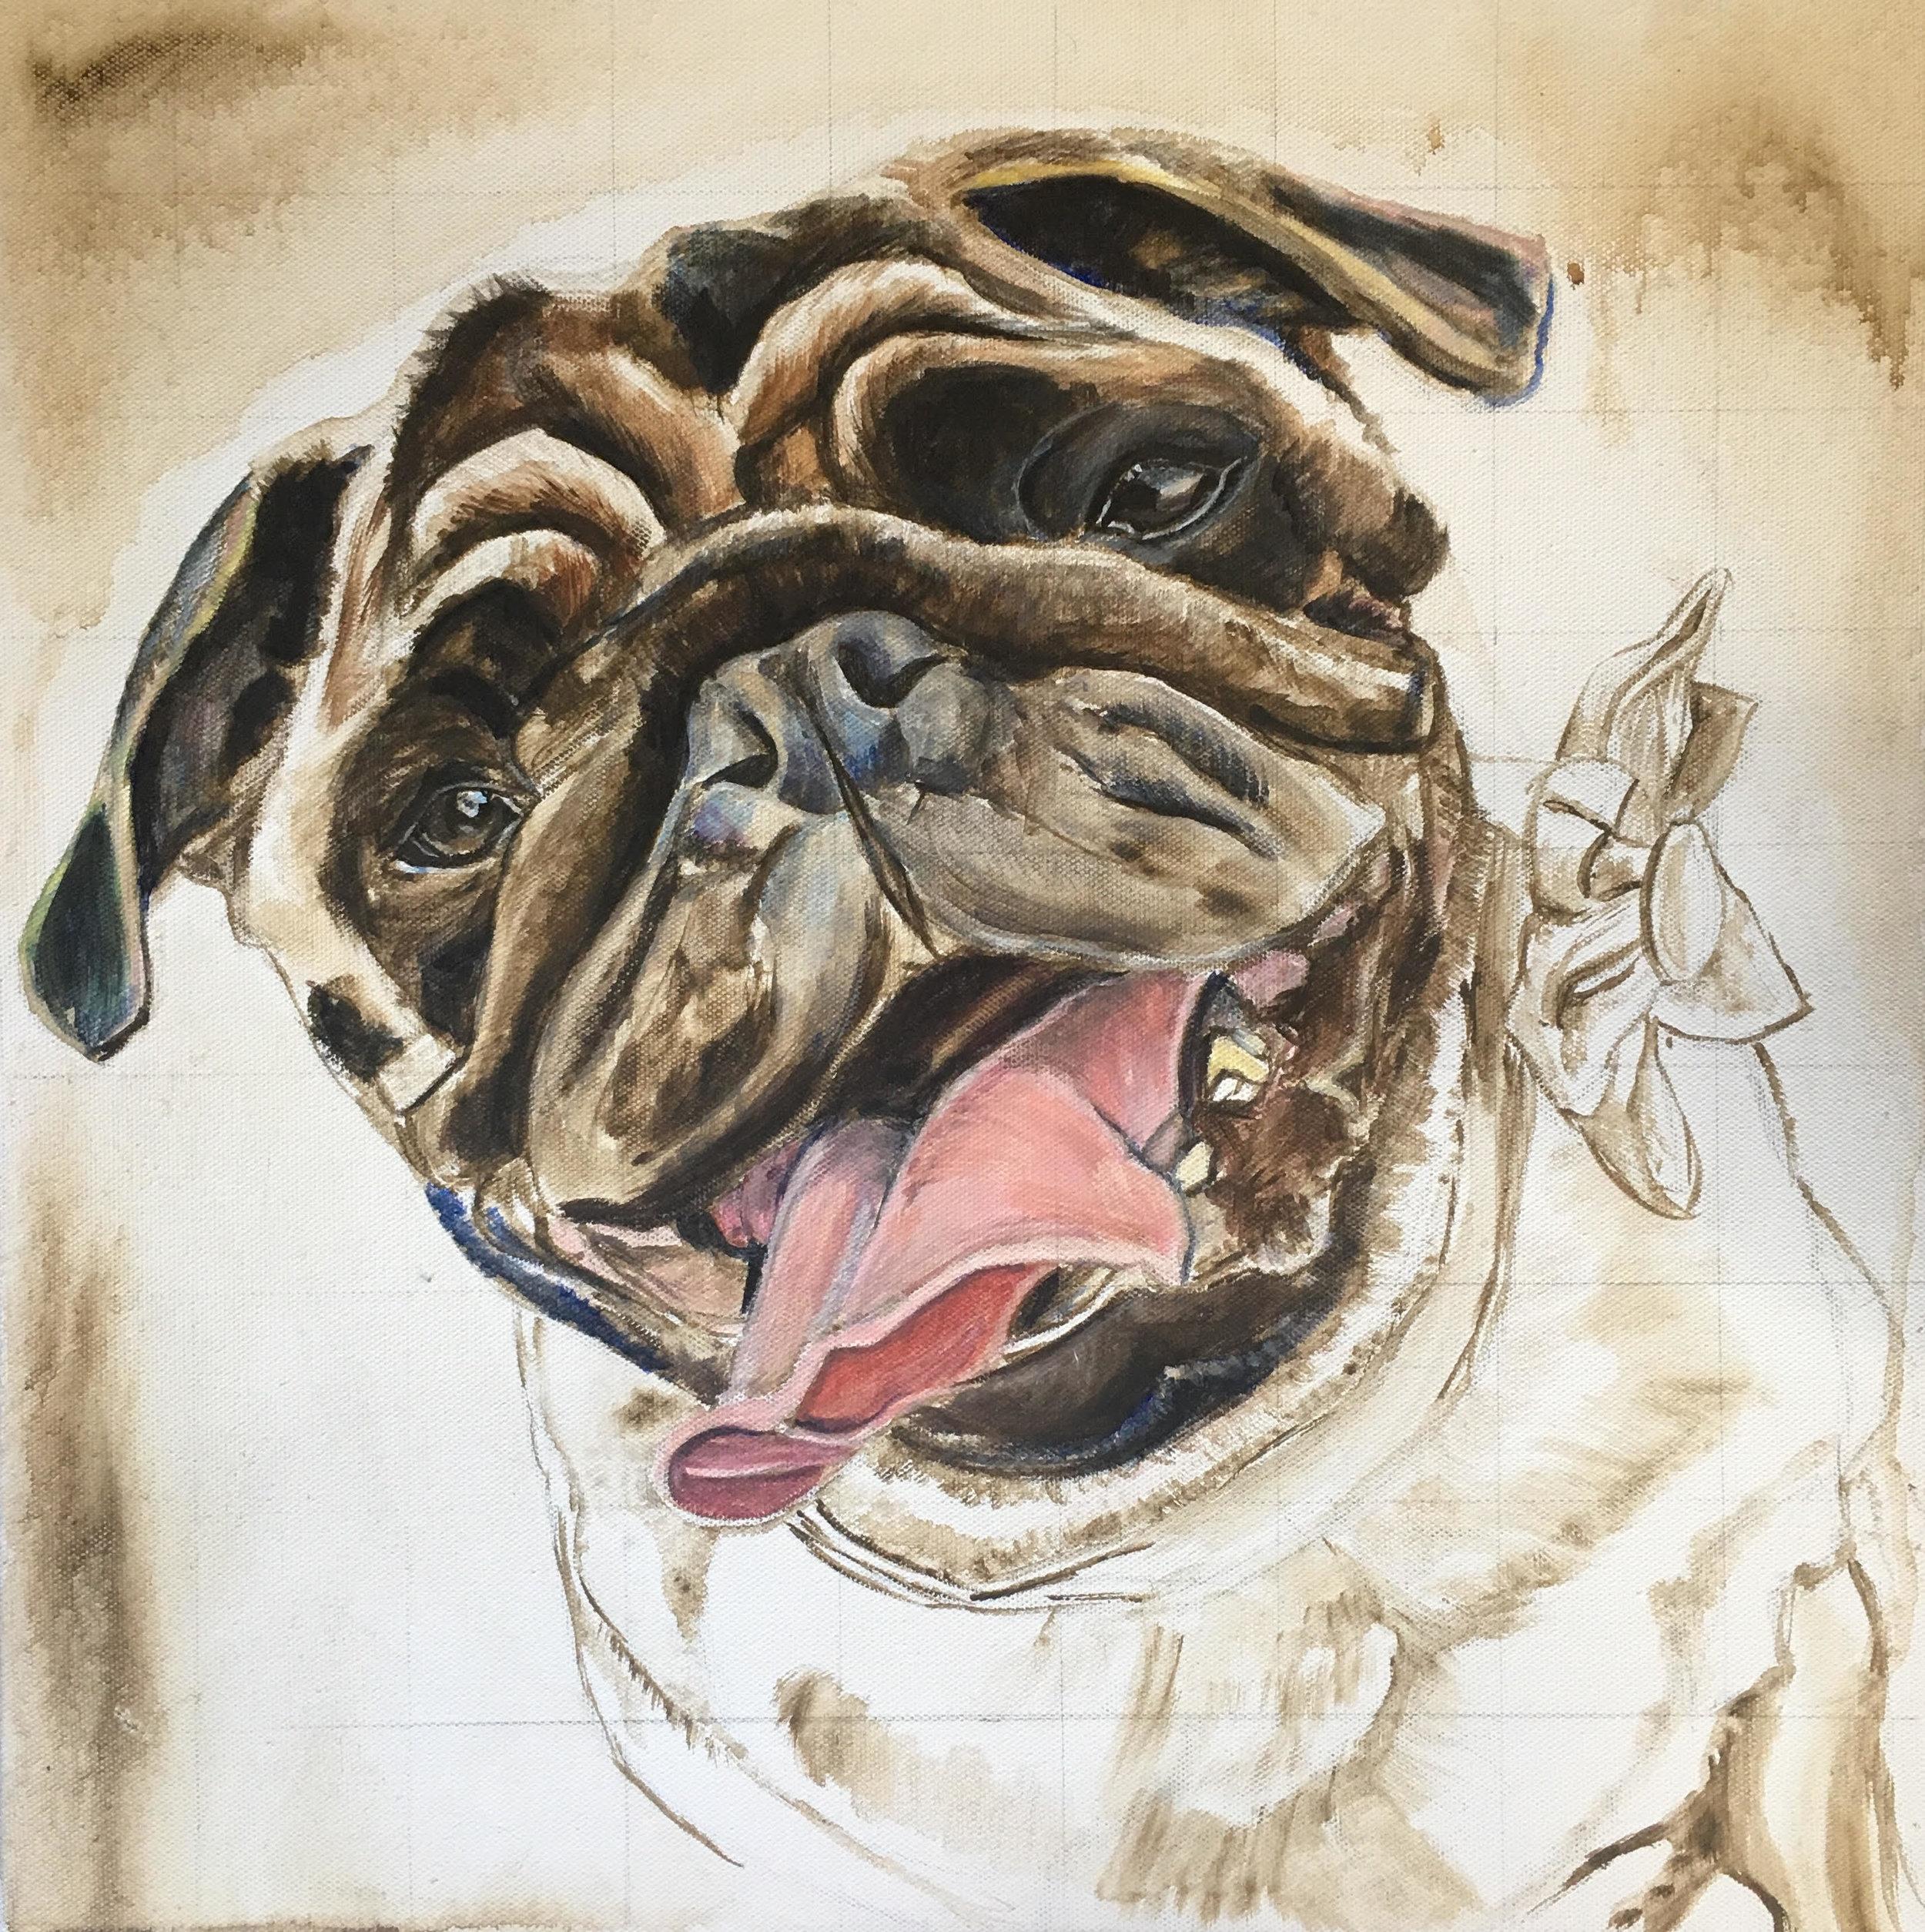 PUG DOG UNDER PAINTING 1. CUSTOM PORTRAIT BY OPAL PASTRO ART